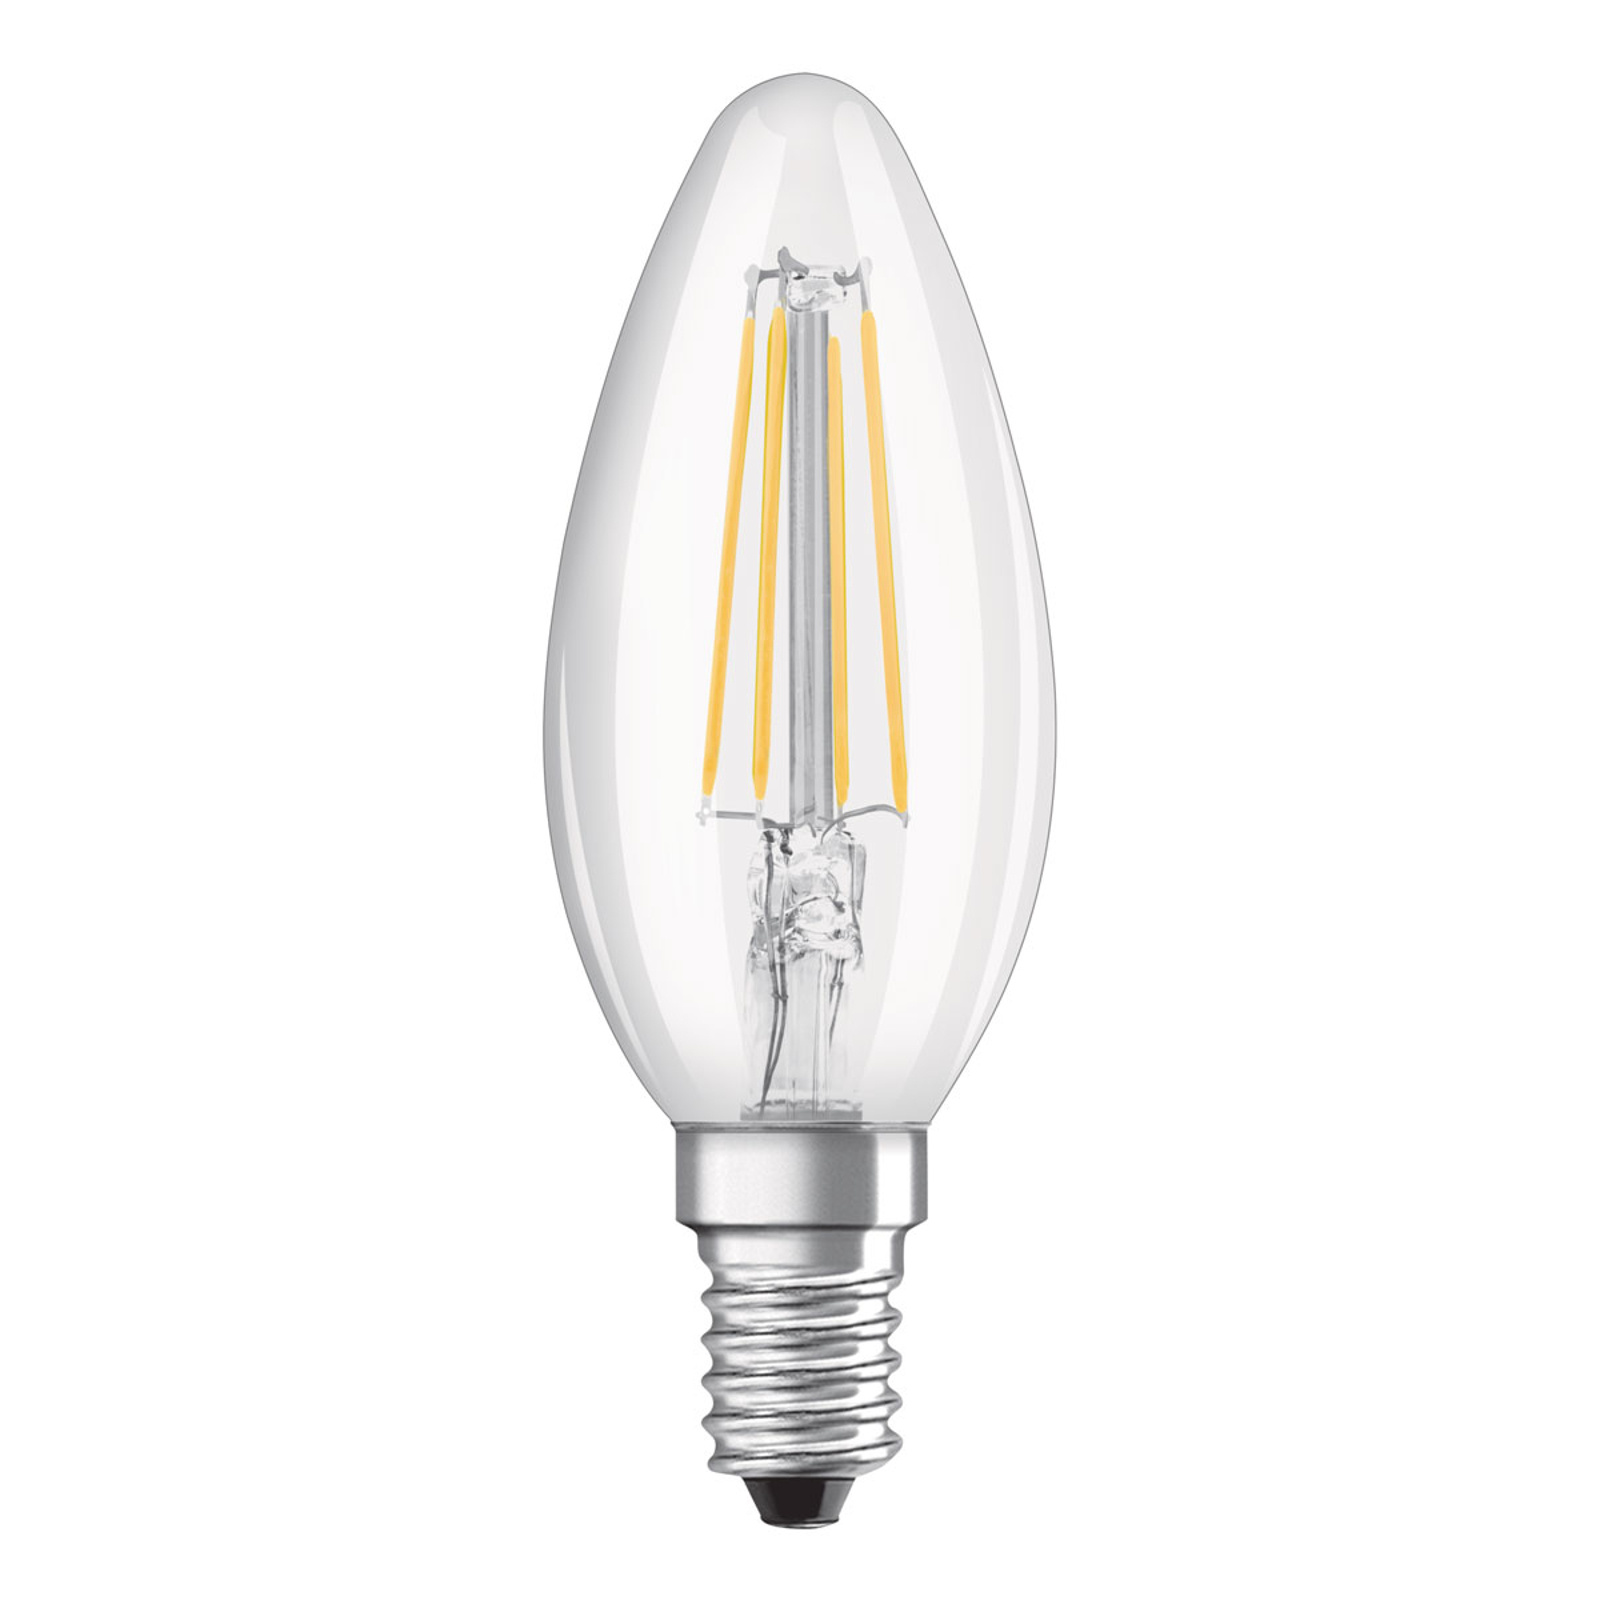 OSRAM-LED-kynttilälamppu E14 4W Classic B 2 700 K